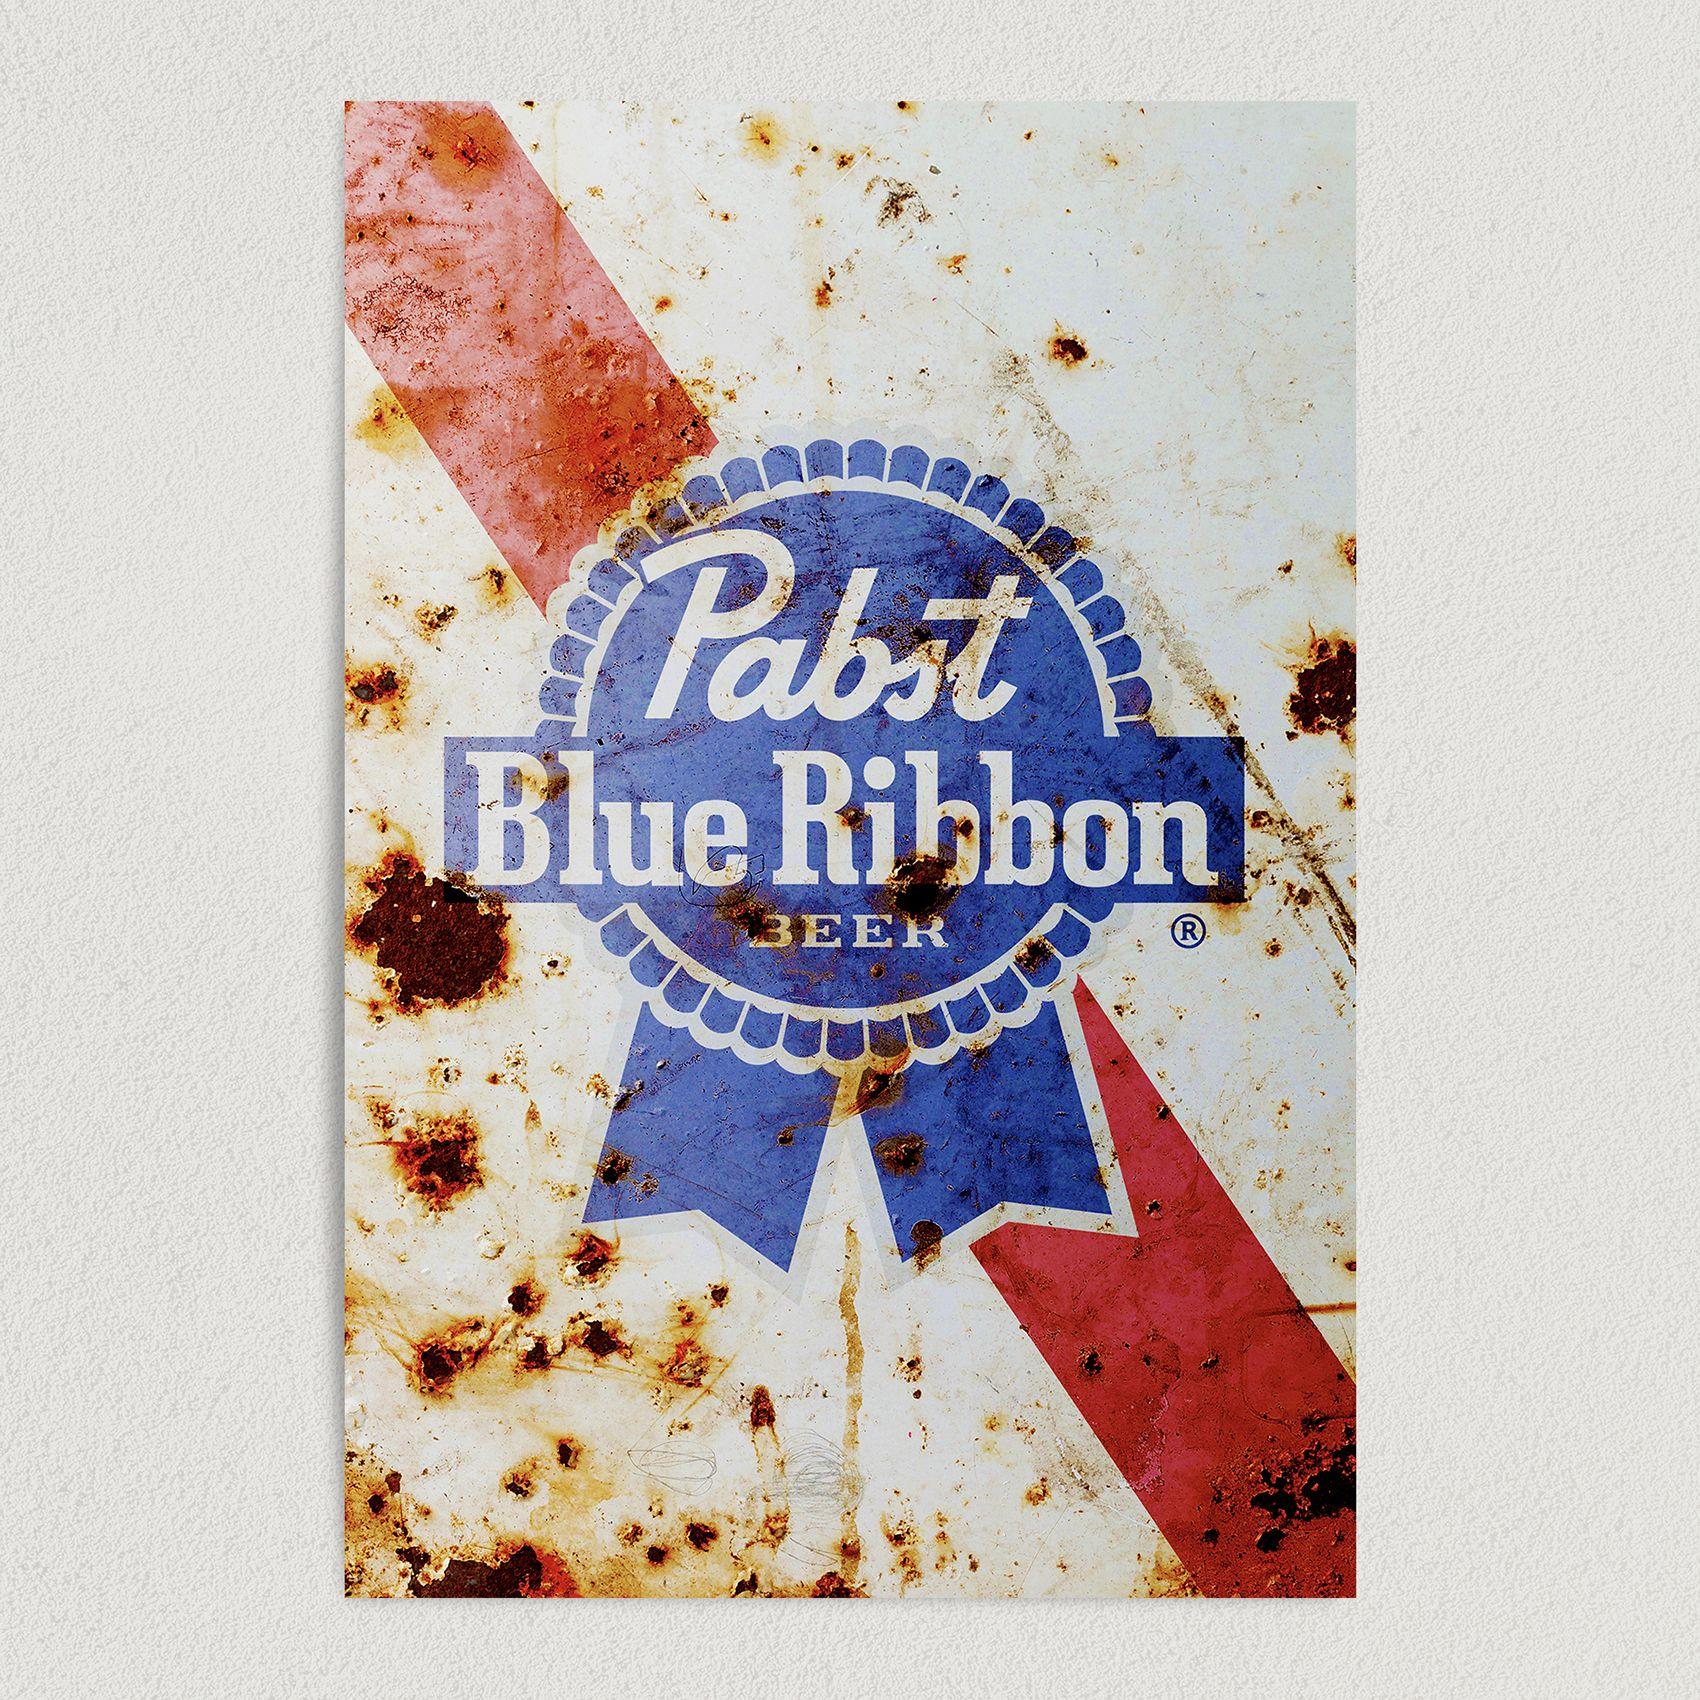 Pabst Blue Ribbon Rusted Logo Art Print Poster 12″ x 18″ Wall Art AL2147